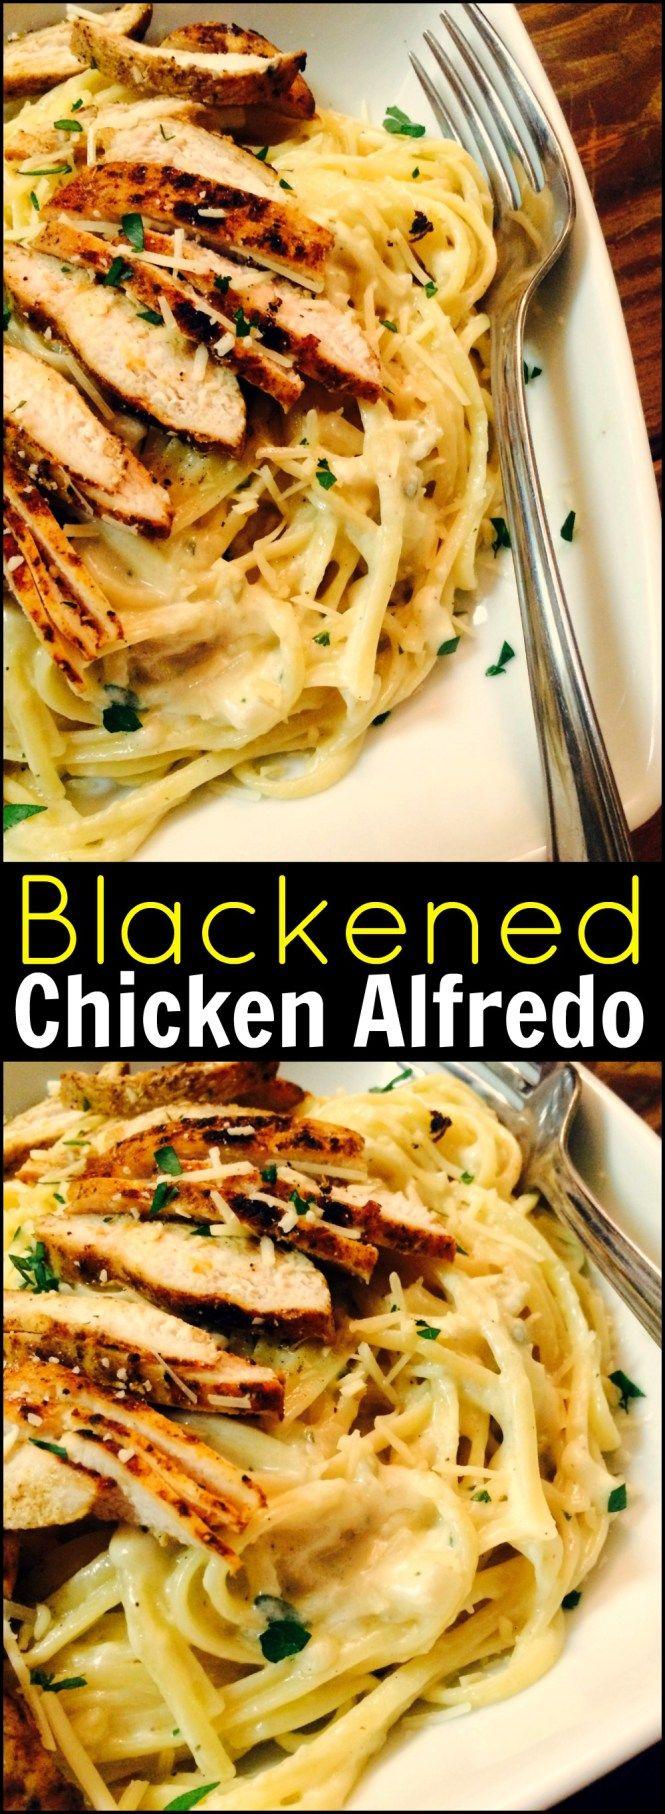 Blackened Chicken Alfredo | Aunt Bee's Recipes